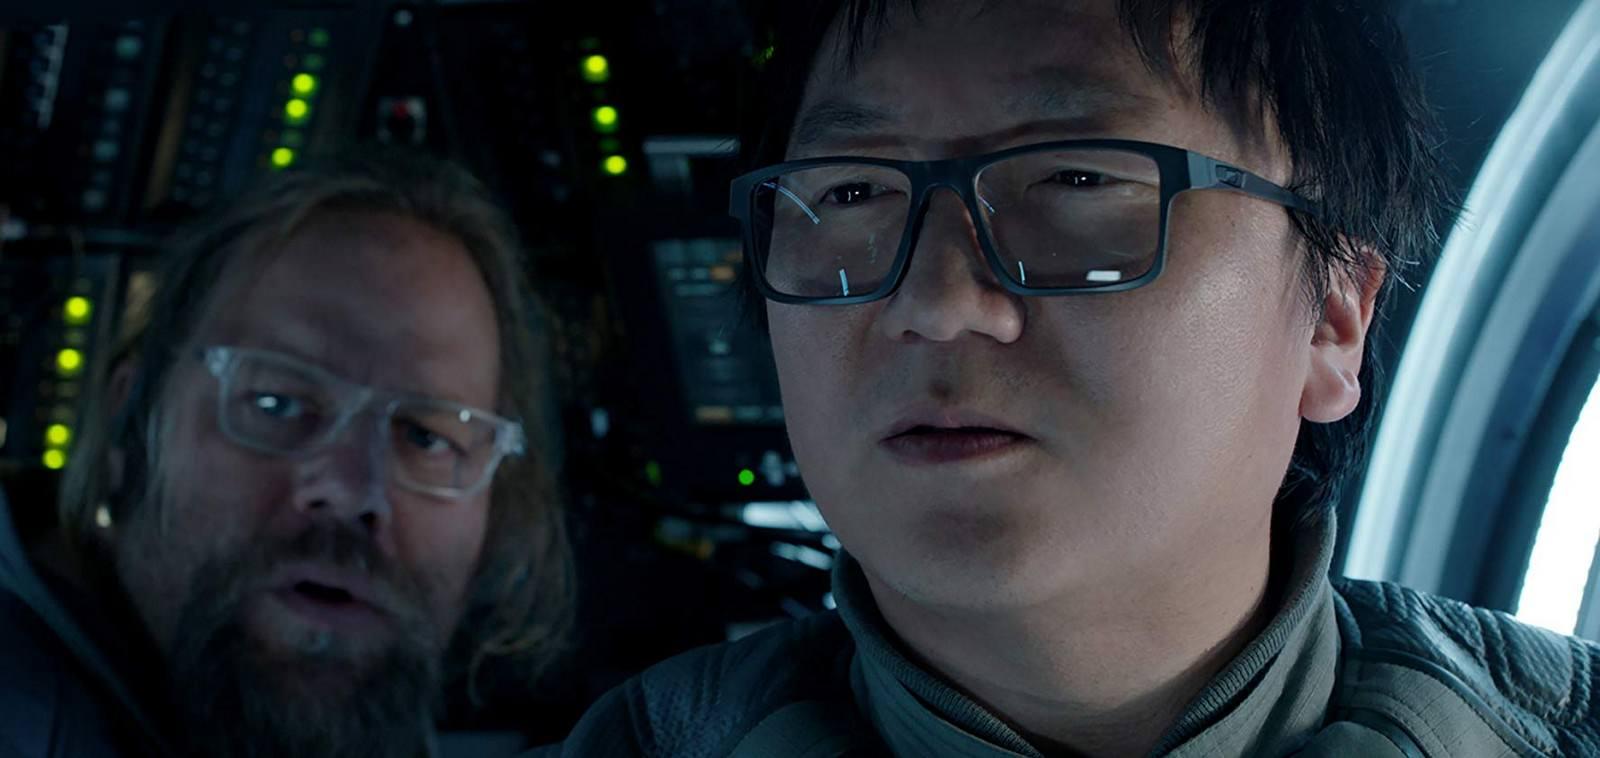 Movie, The Meg(美國.中國, 2018) / 巨齒鯊(台) / 巨齿鲨(中) / 極悍巨鯊(港), 電影劇照